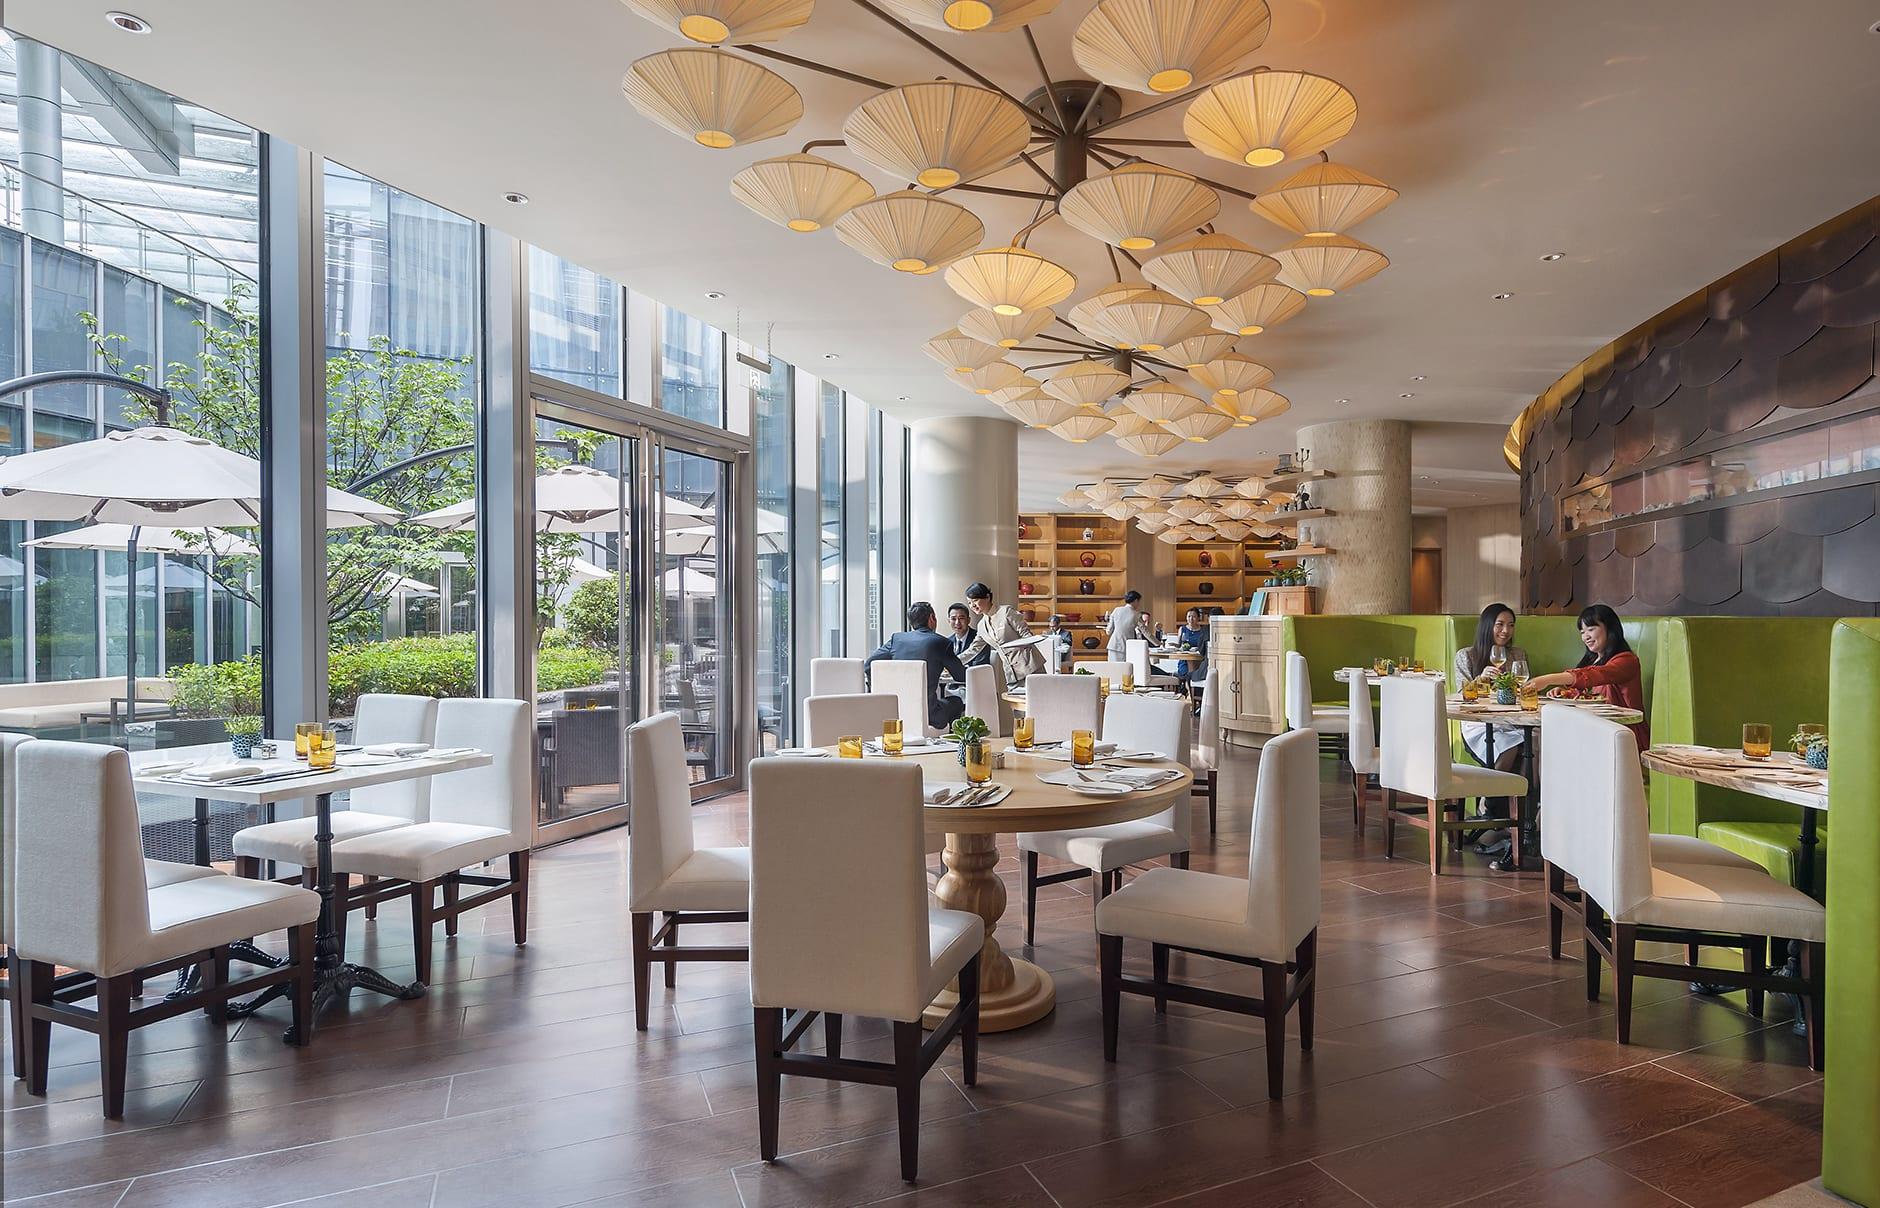 Mandarin Oriental Pudong, Shanghai, China. © Mandarin Oriental Hotel Group